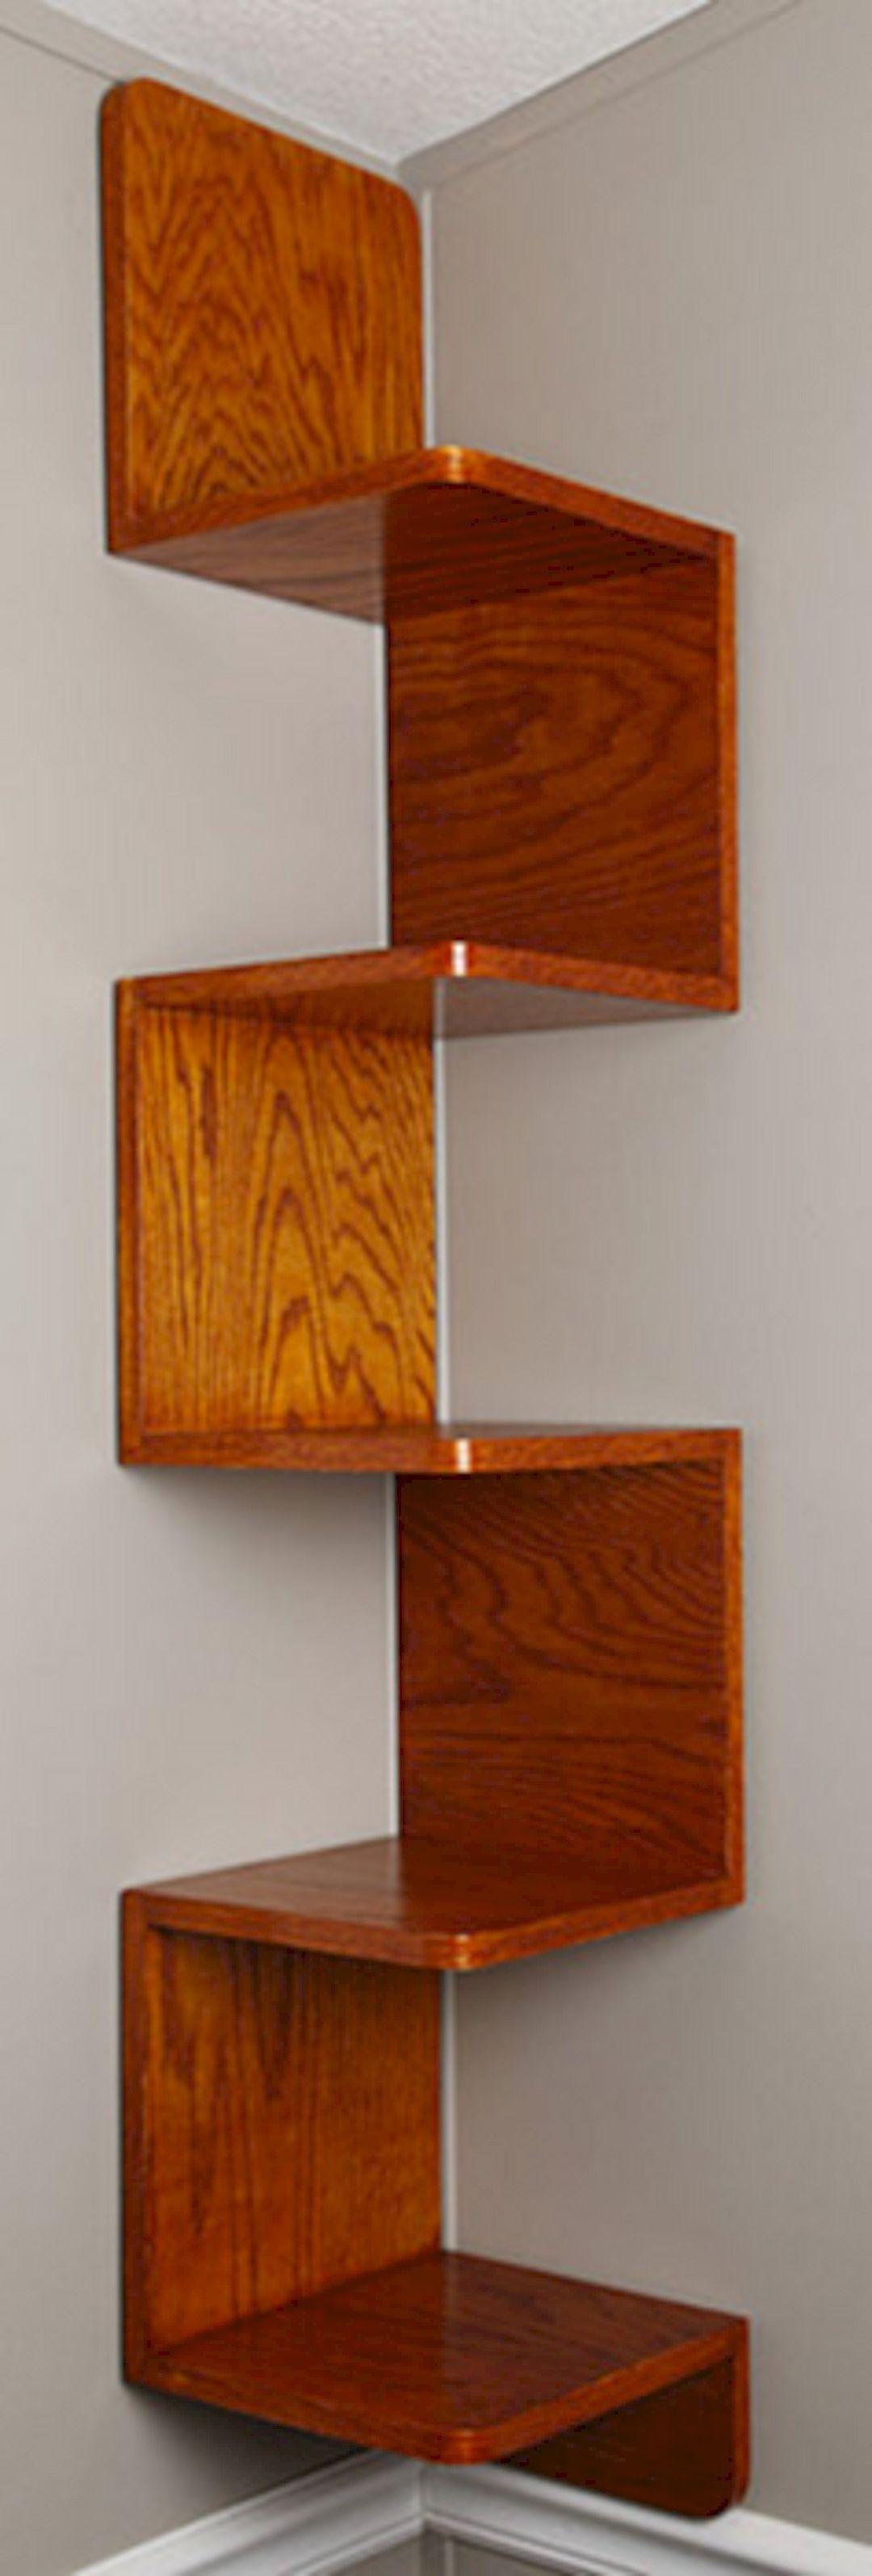 zig zag corner wall shelf ideas on foter rh foter com zig zag corner wall shelves Cat Wall Shelves